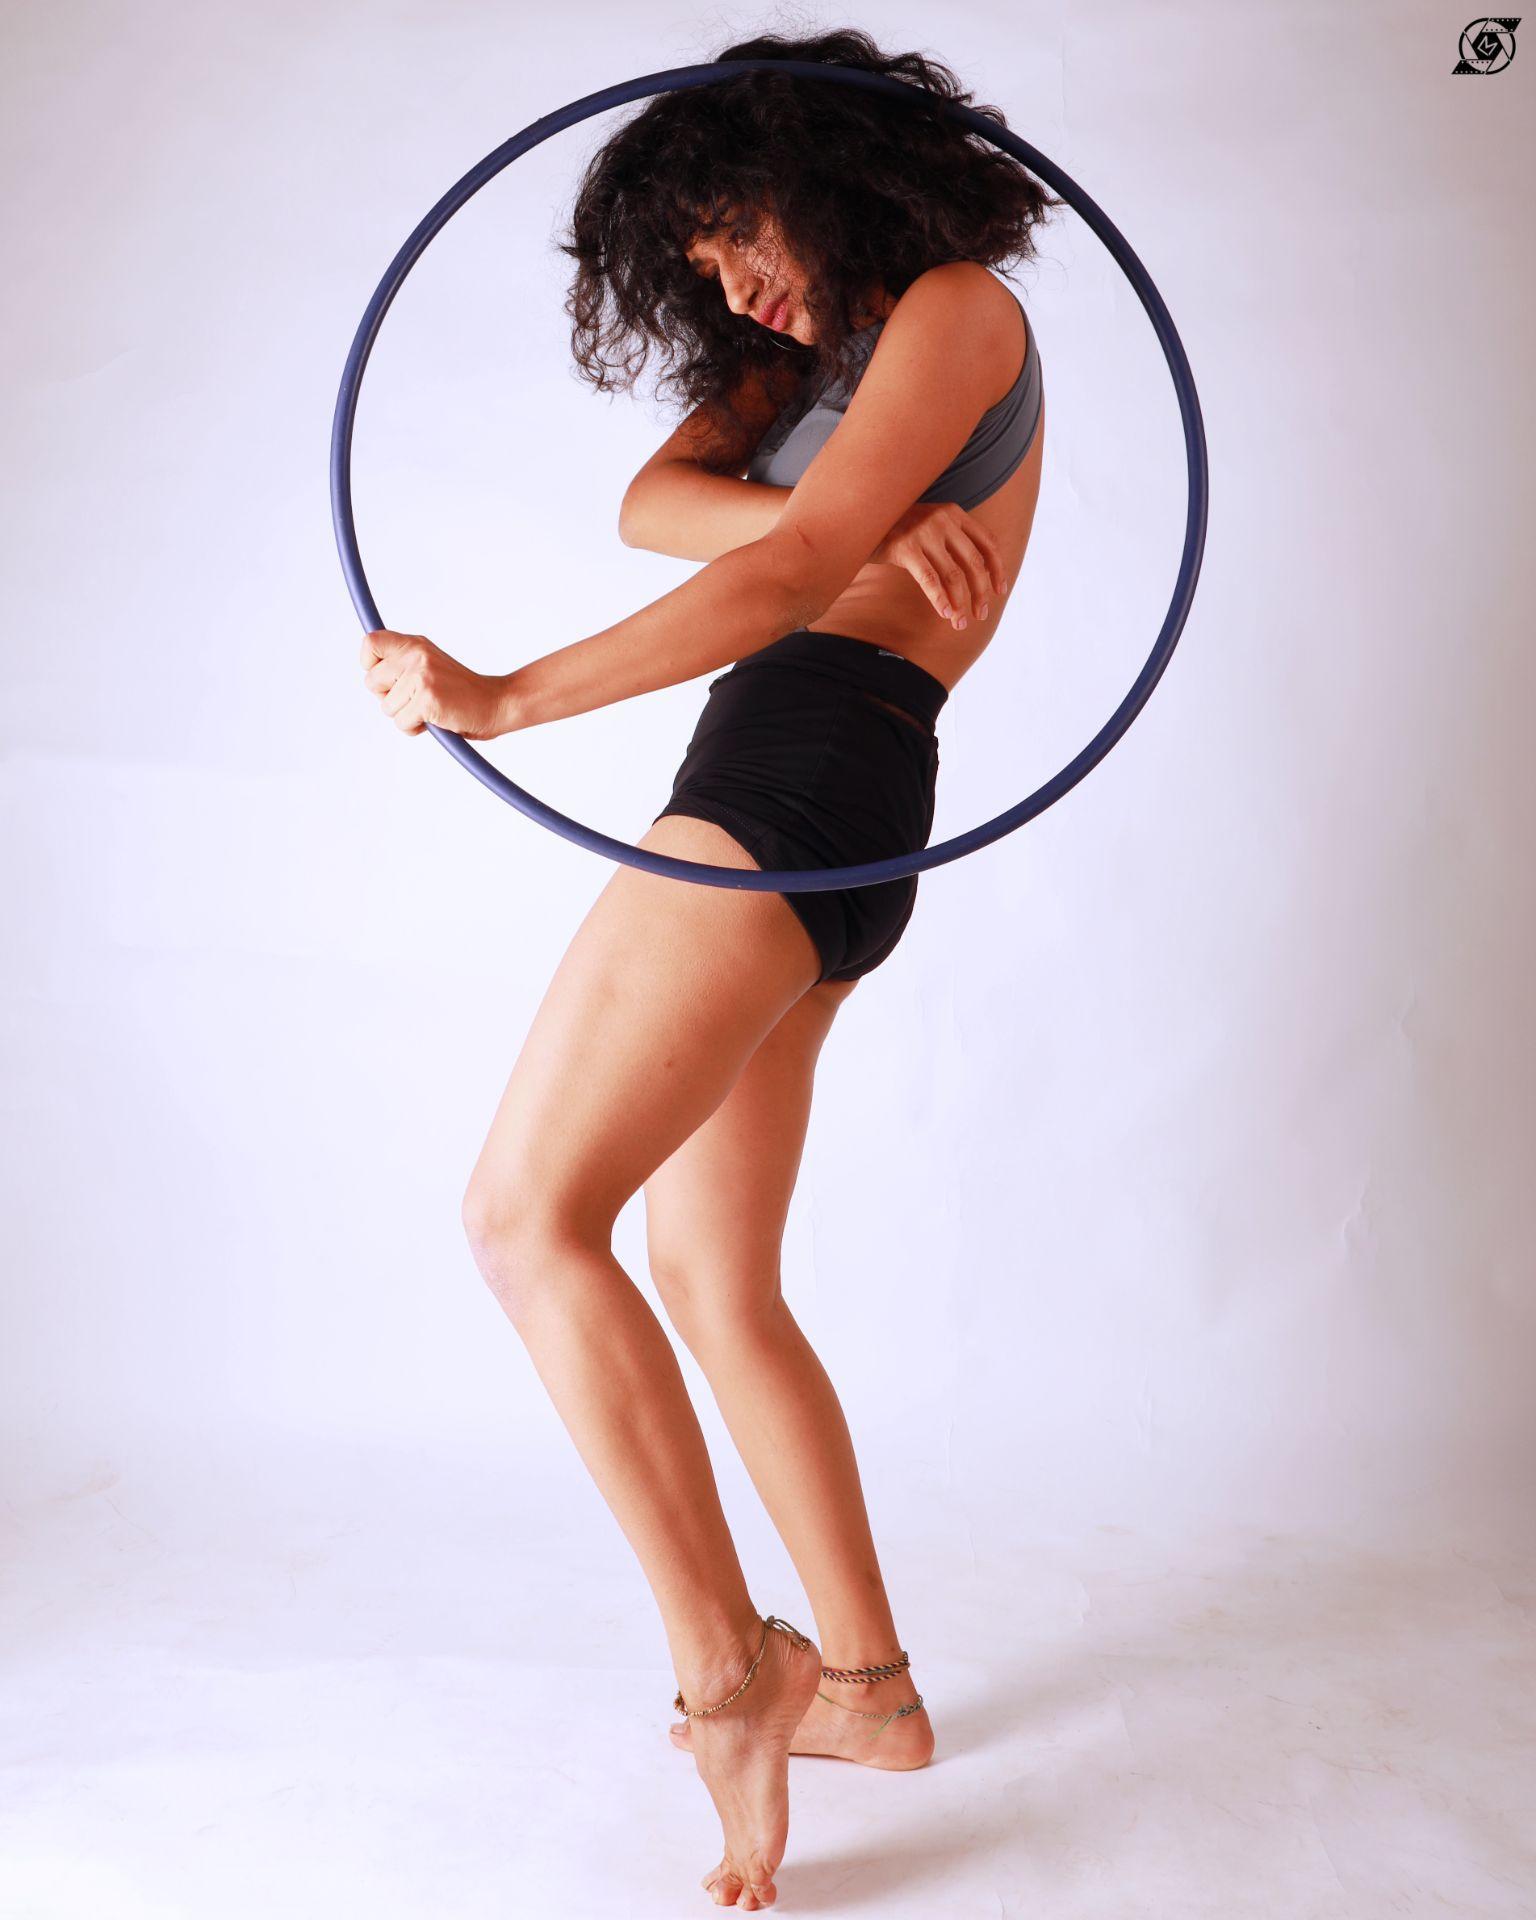 hoop leotard white background posing model shorts flexibility